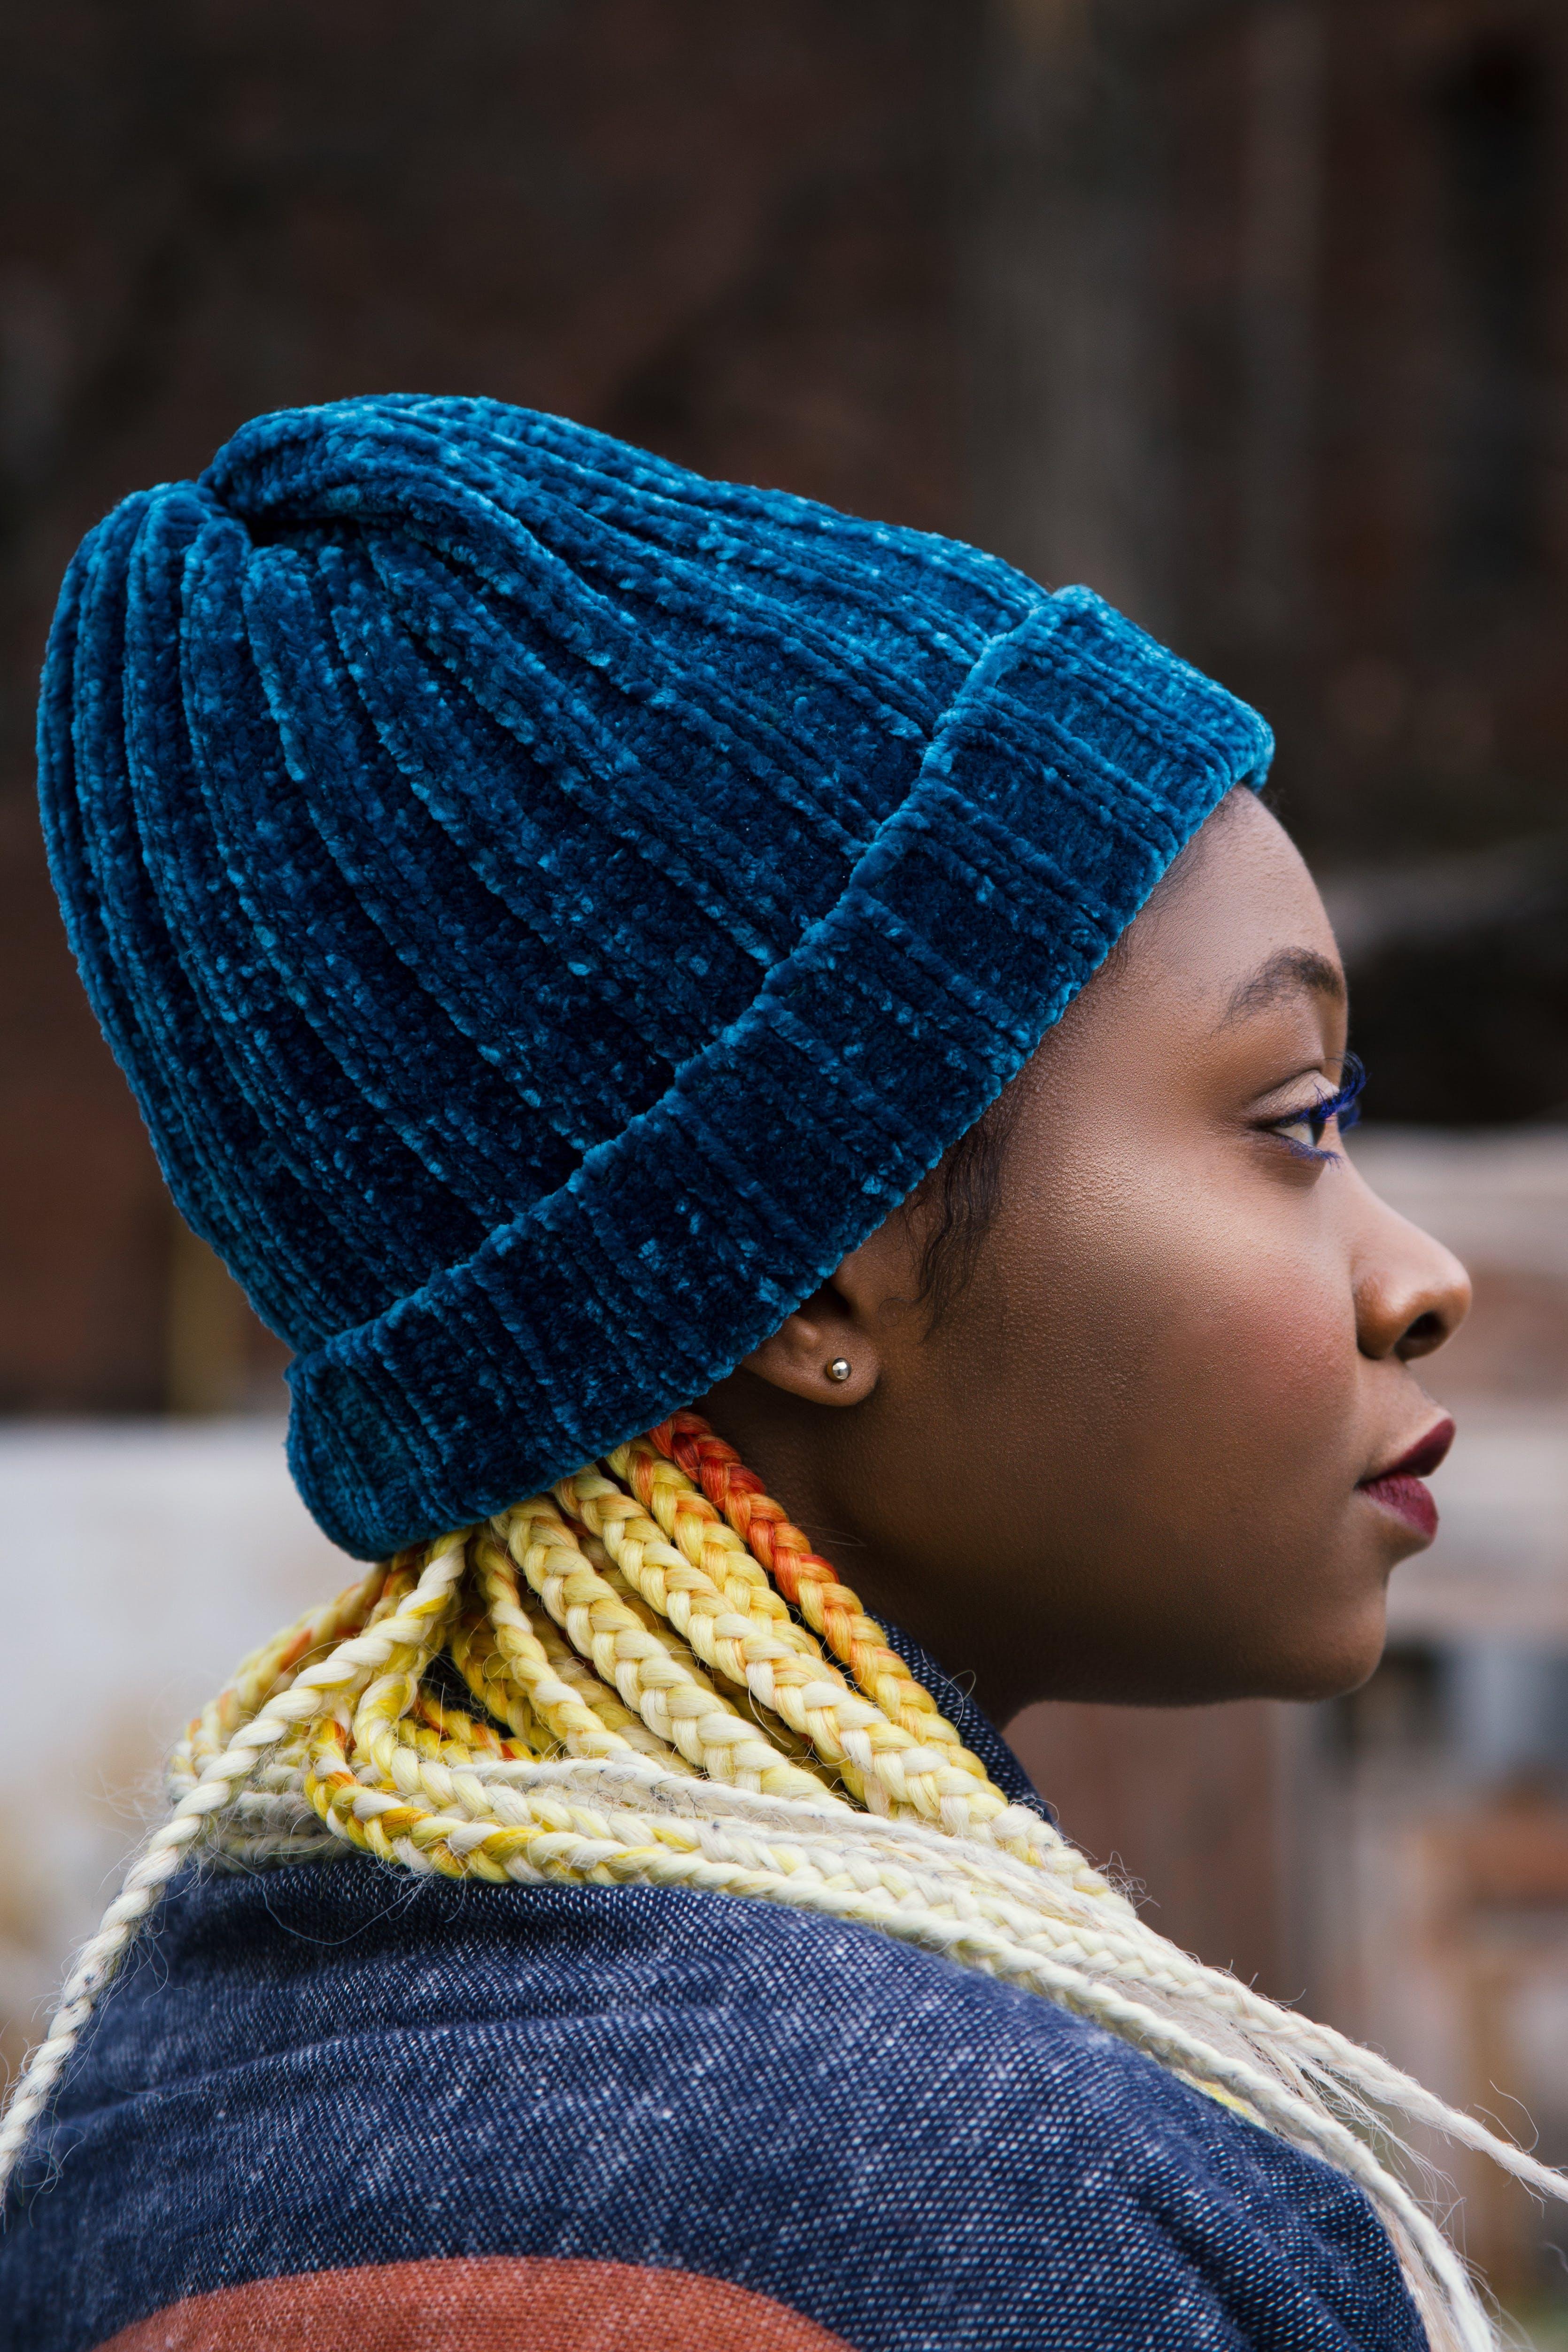 Woman Wearing Teal Knit Cap